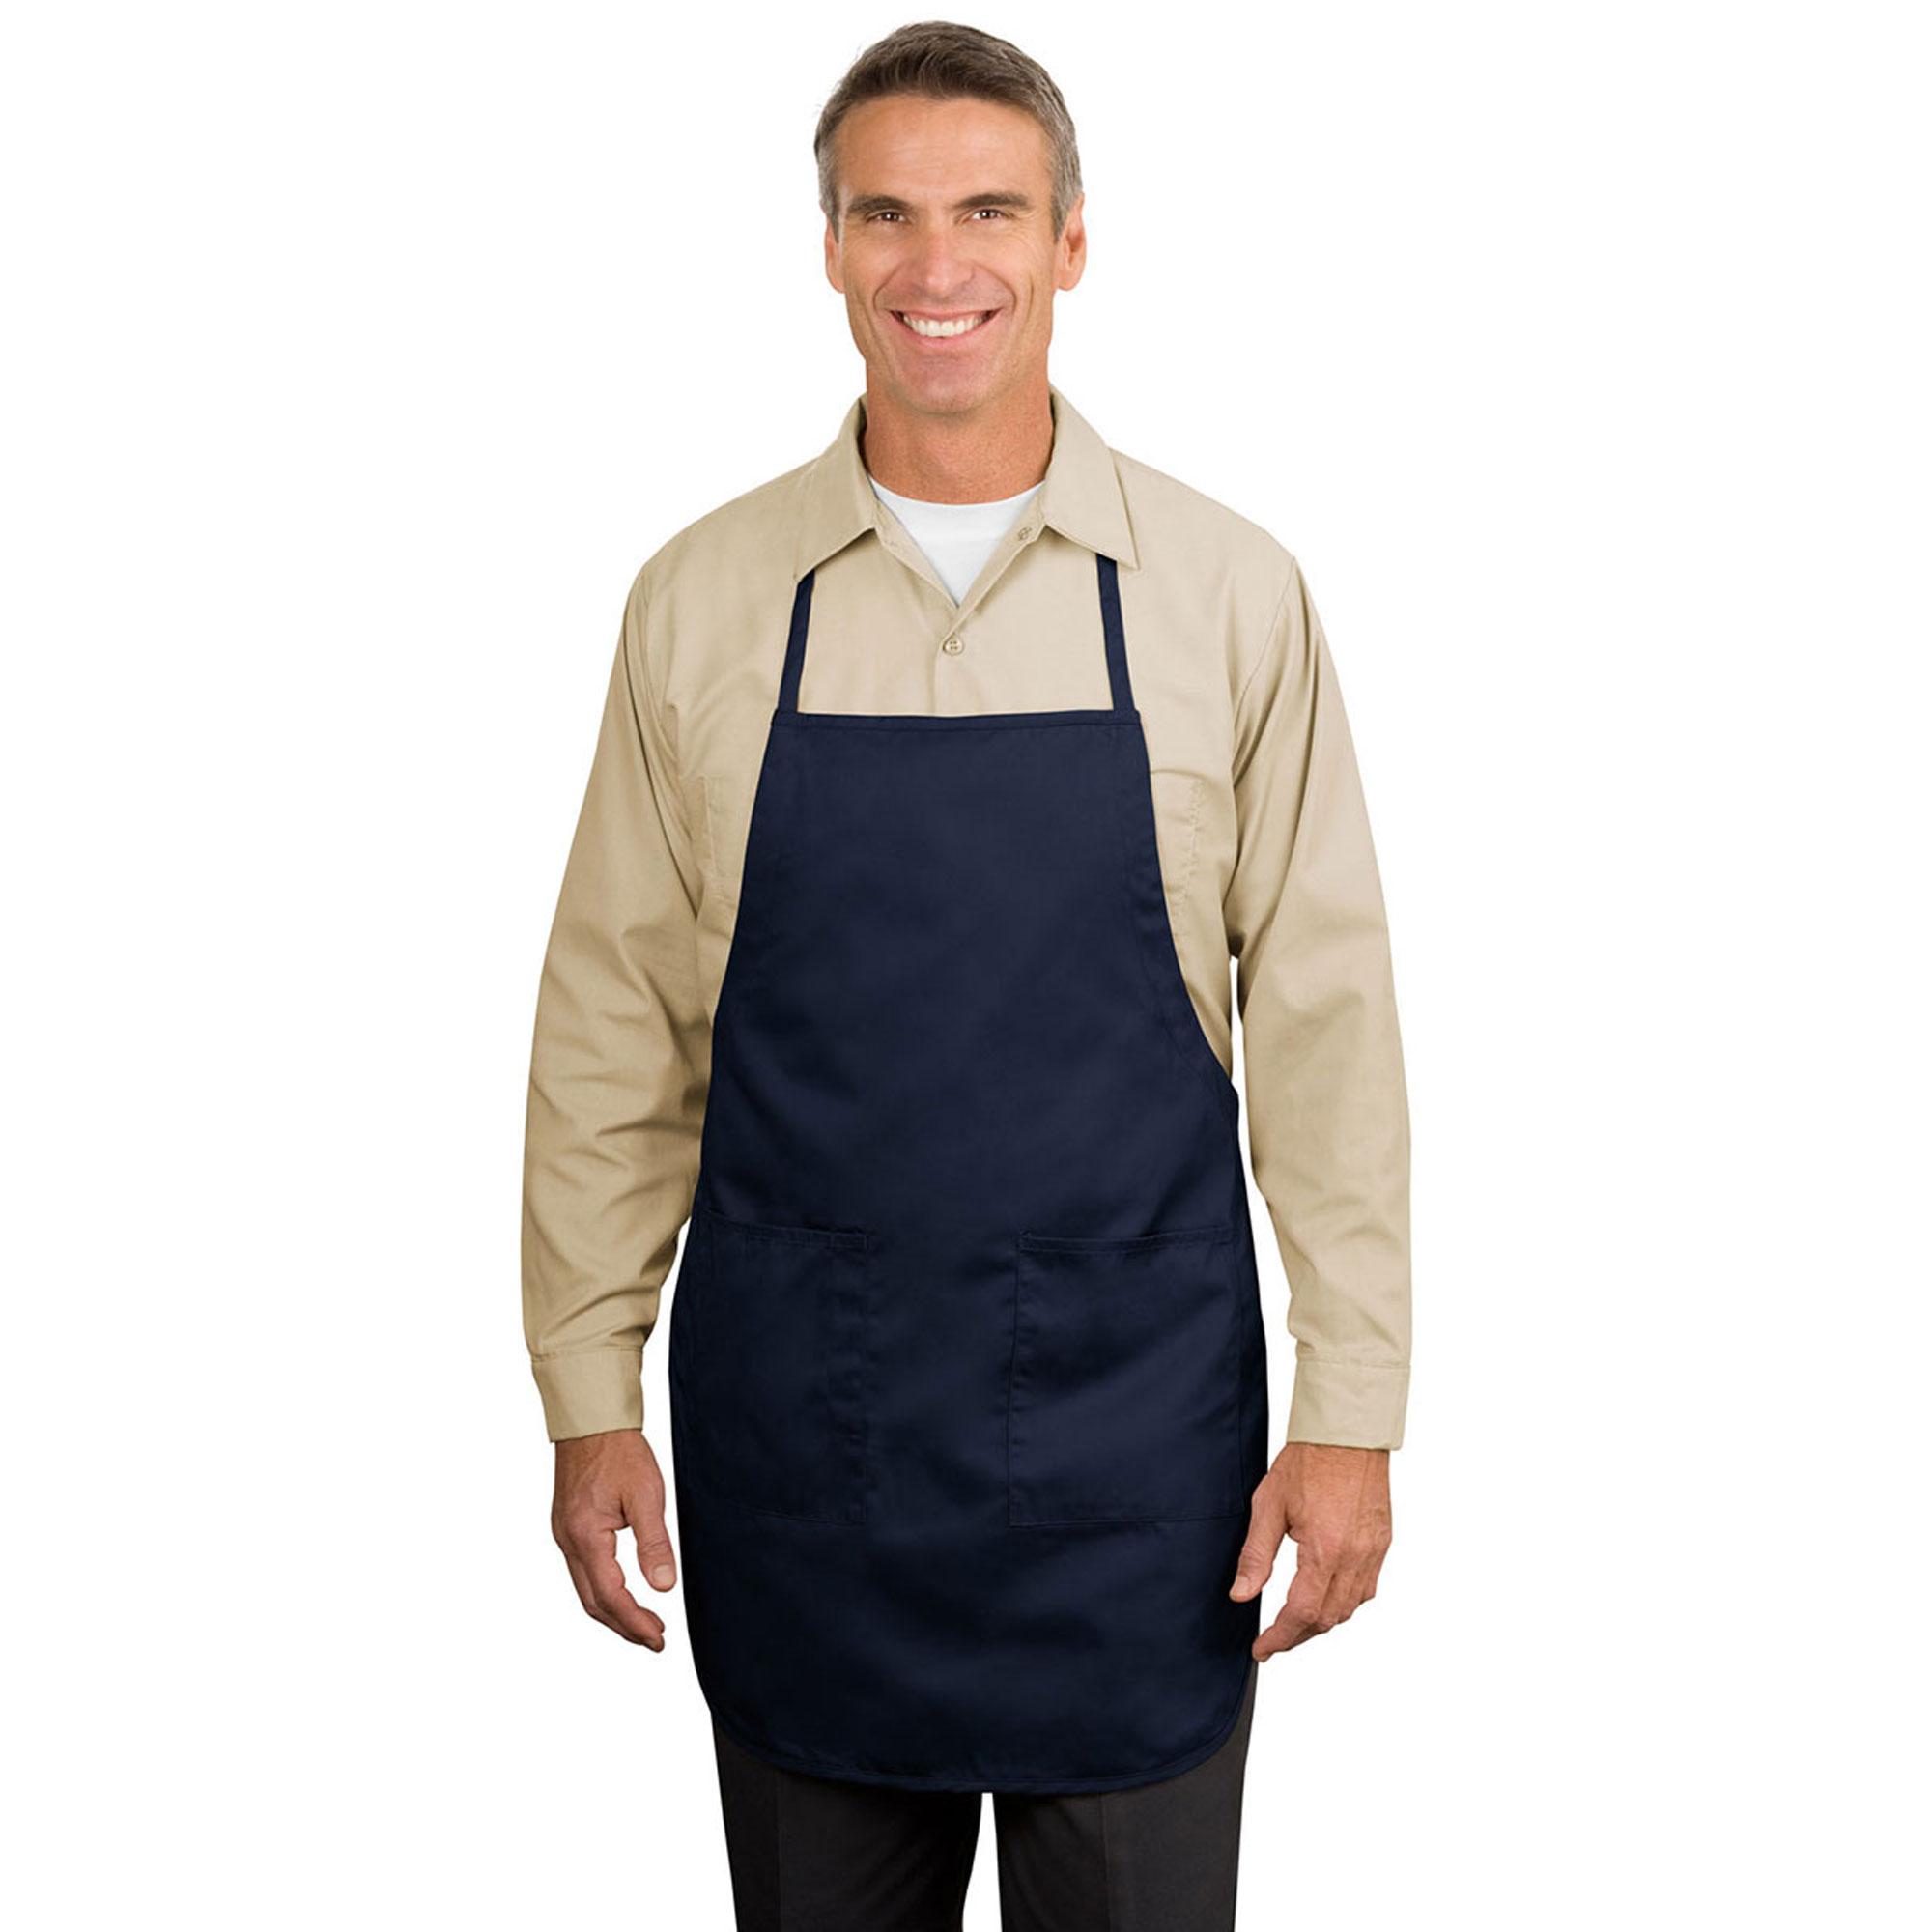 Port Authority Men's Full Length Easy Care Strap Apron